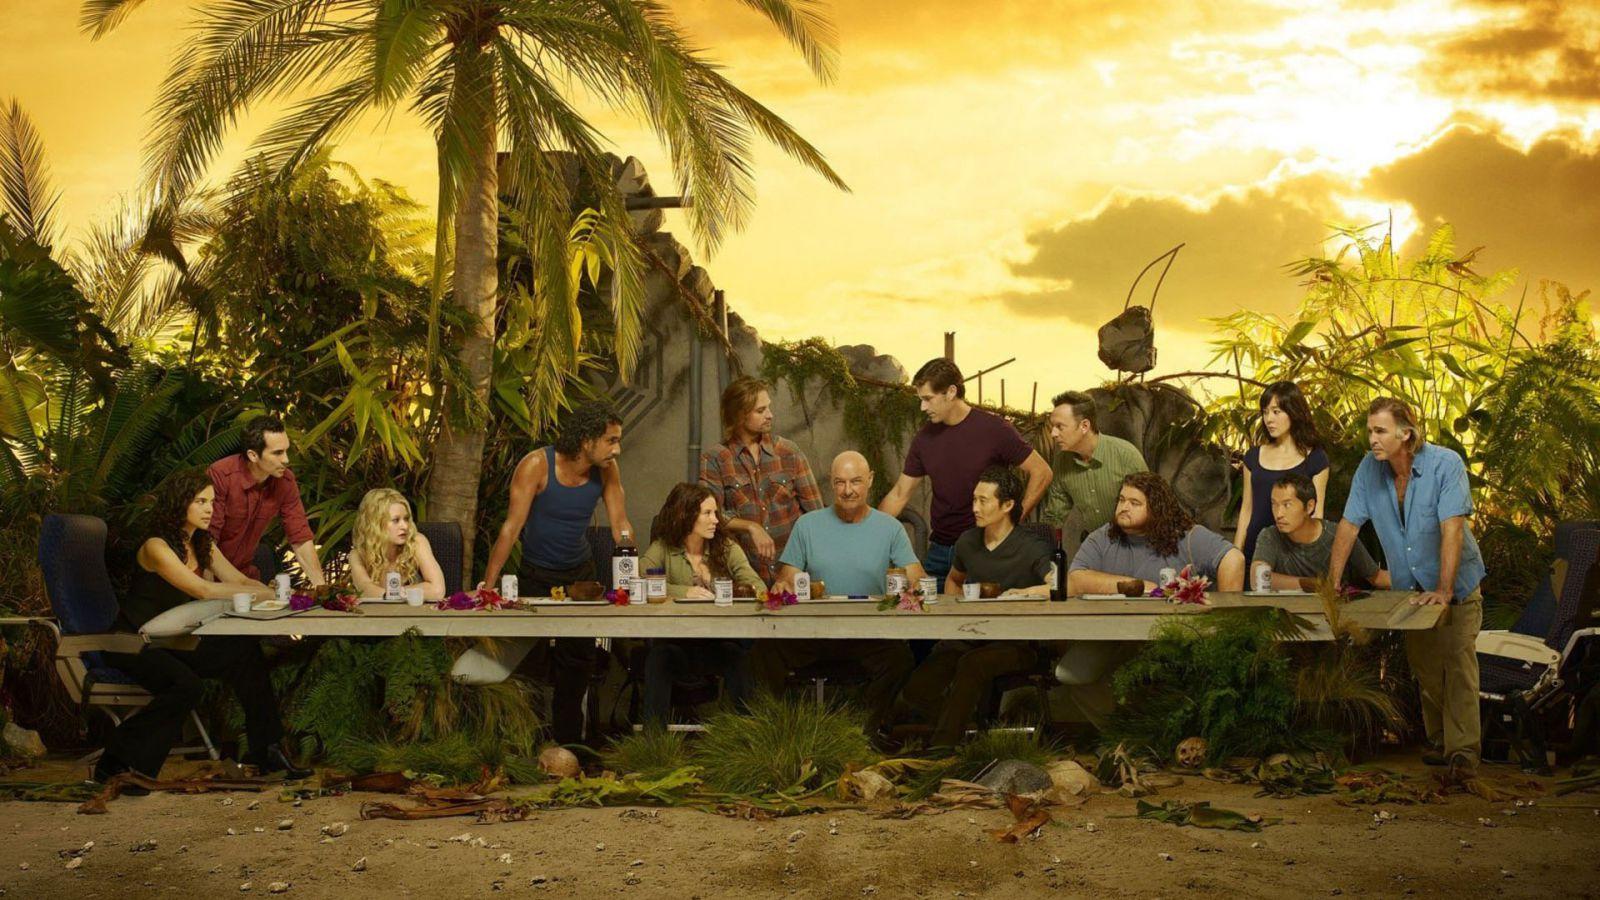 смотреть онлайн леонардо да винчи 2 сезон